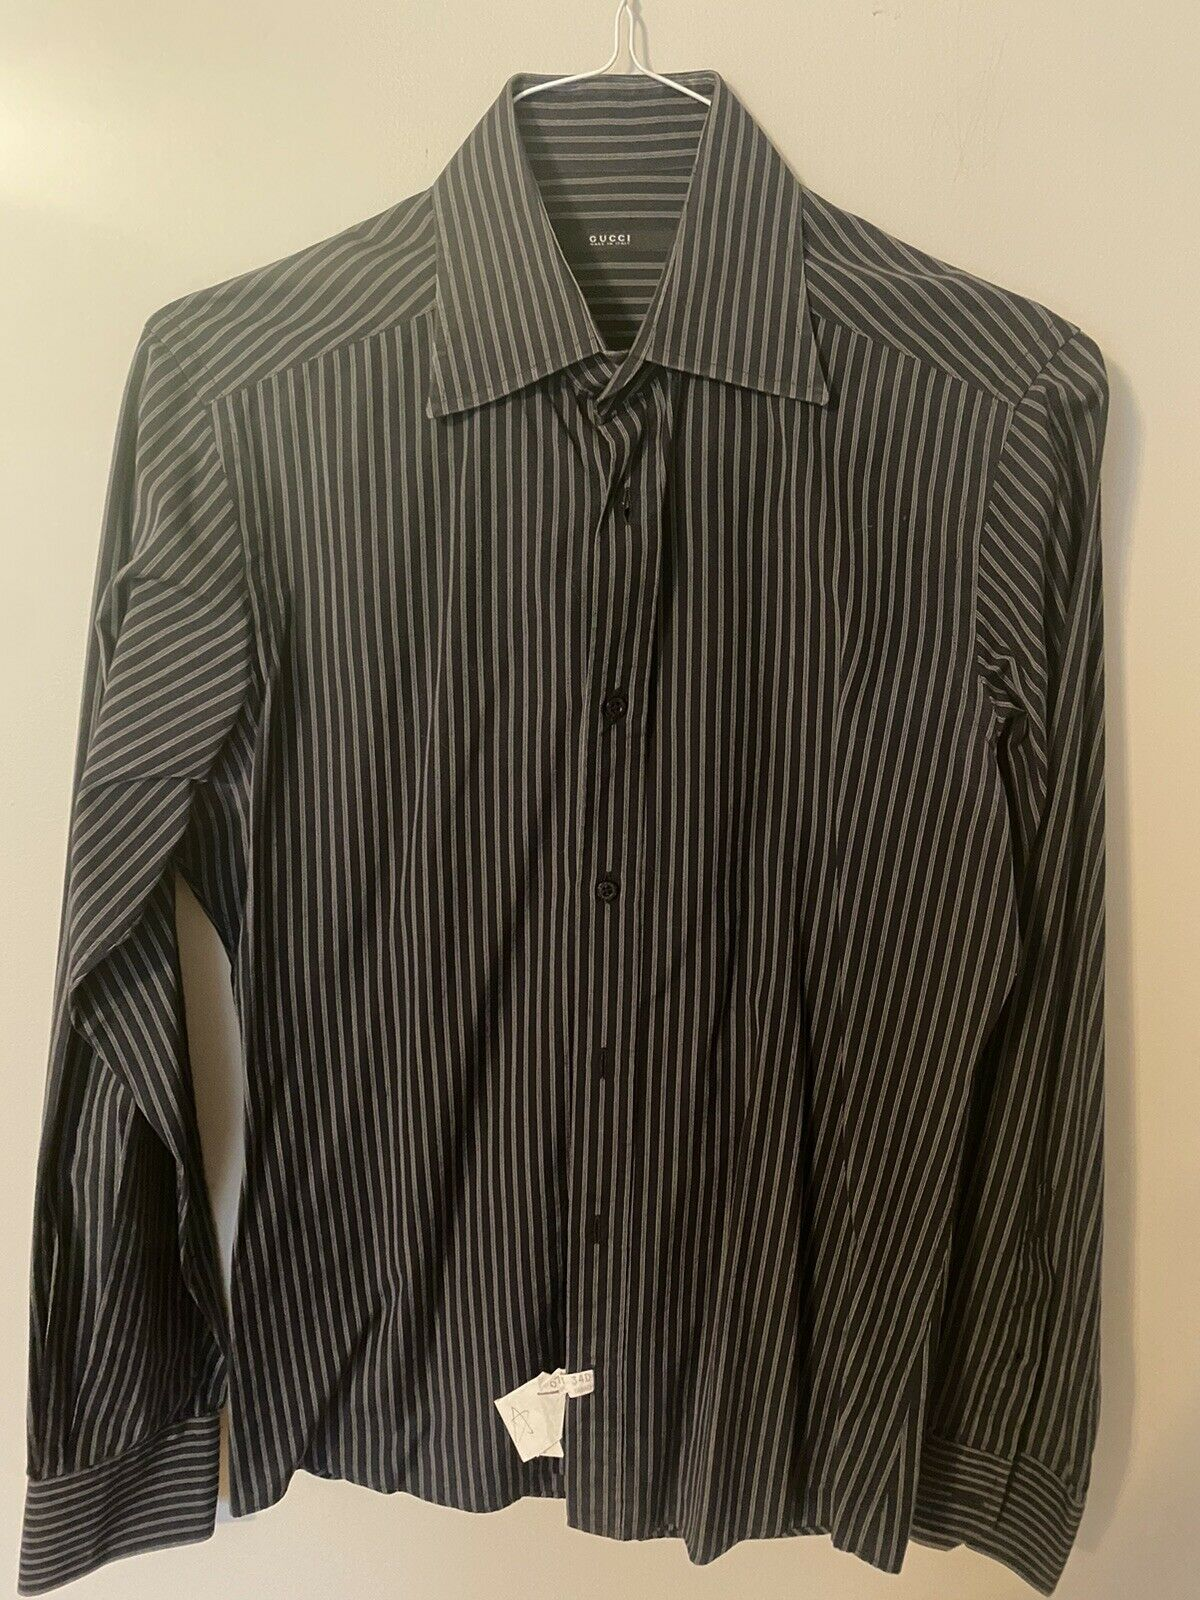 vintage gucci shirt Mens - image 1